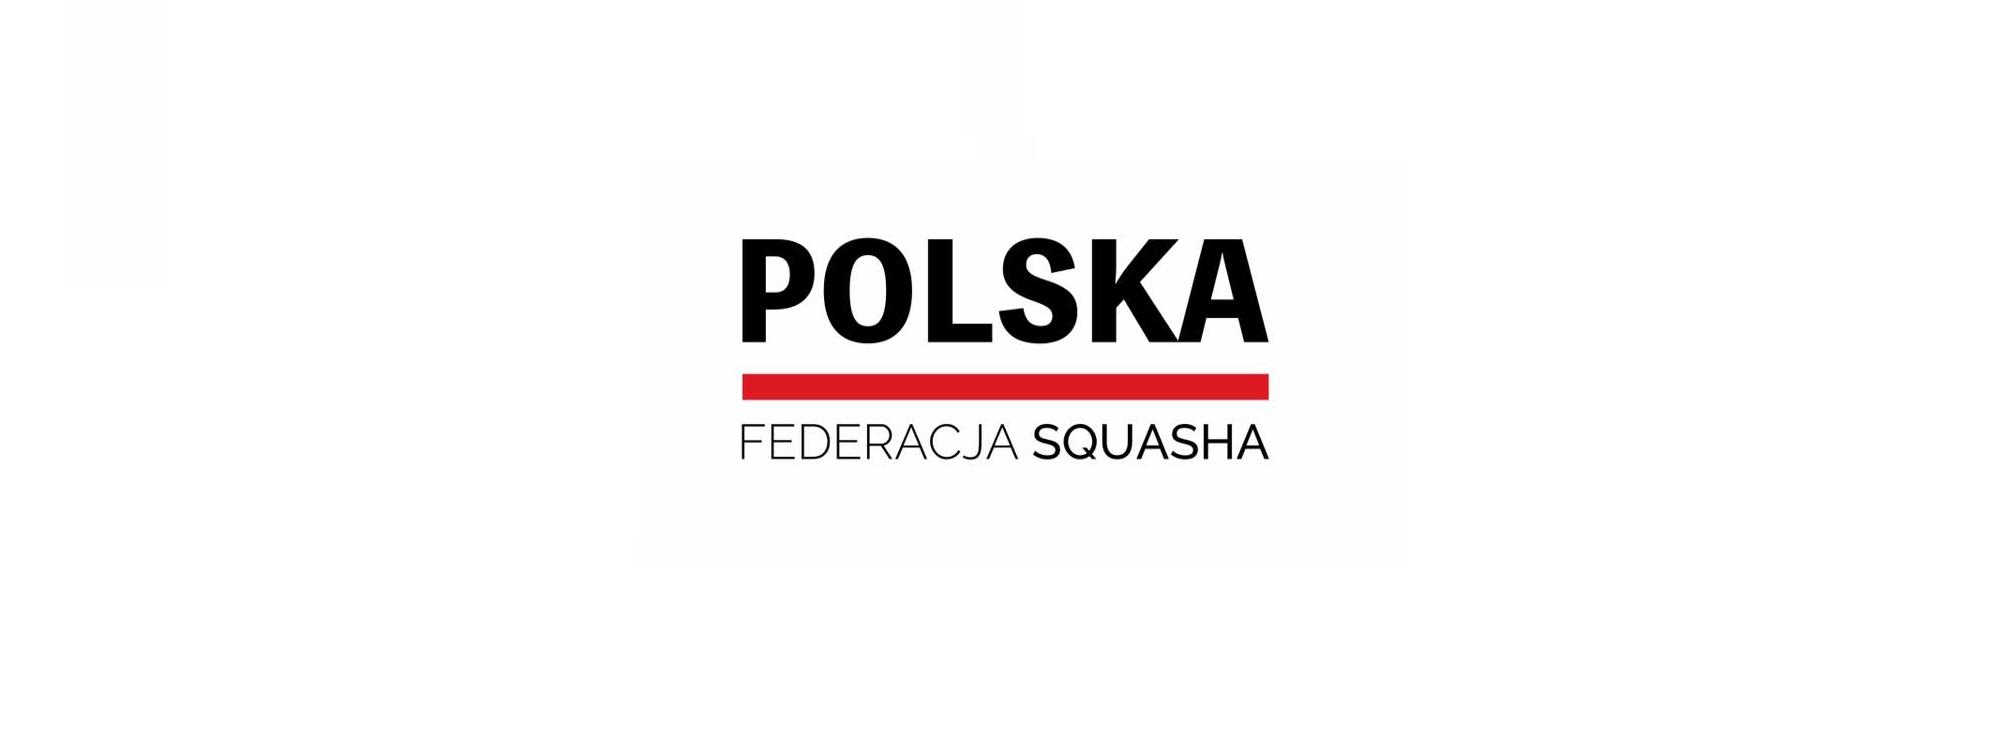 Polska Federacja Squasha